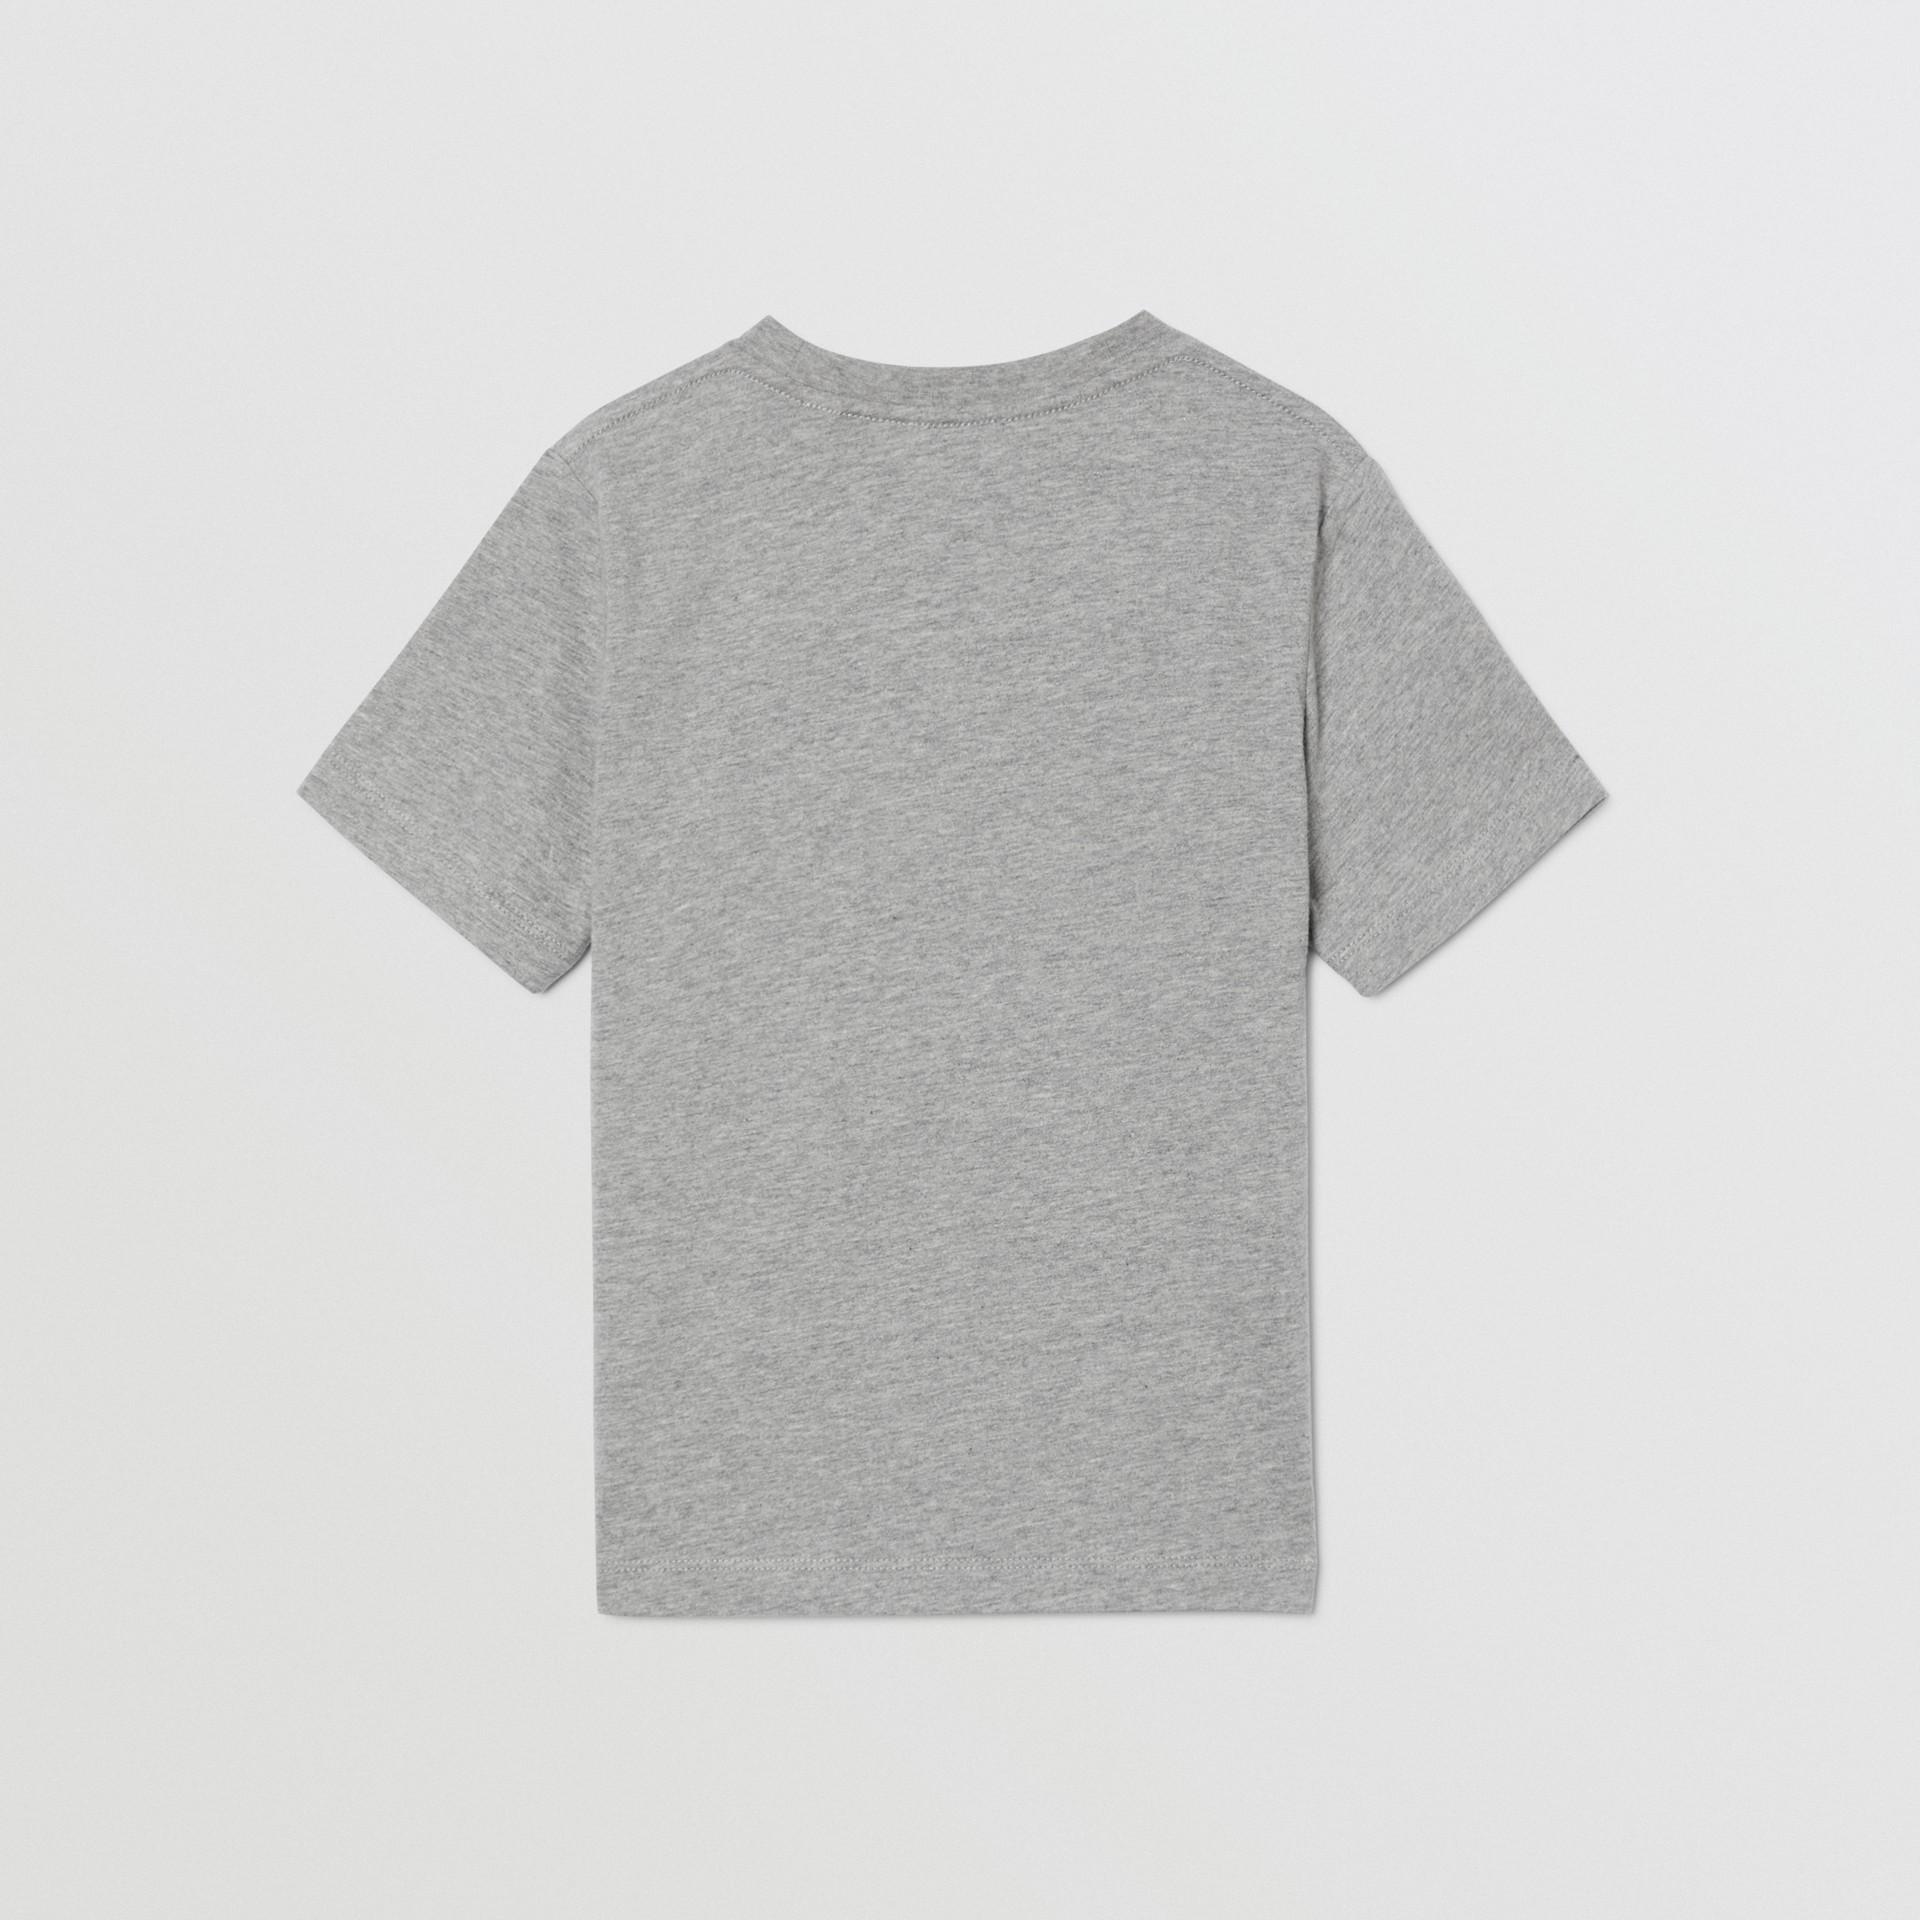 Logo Print Cotton T-shirt in Grey Melange   Burberry - gallery image 4